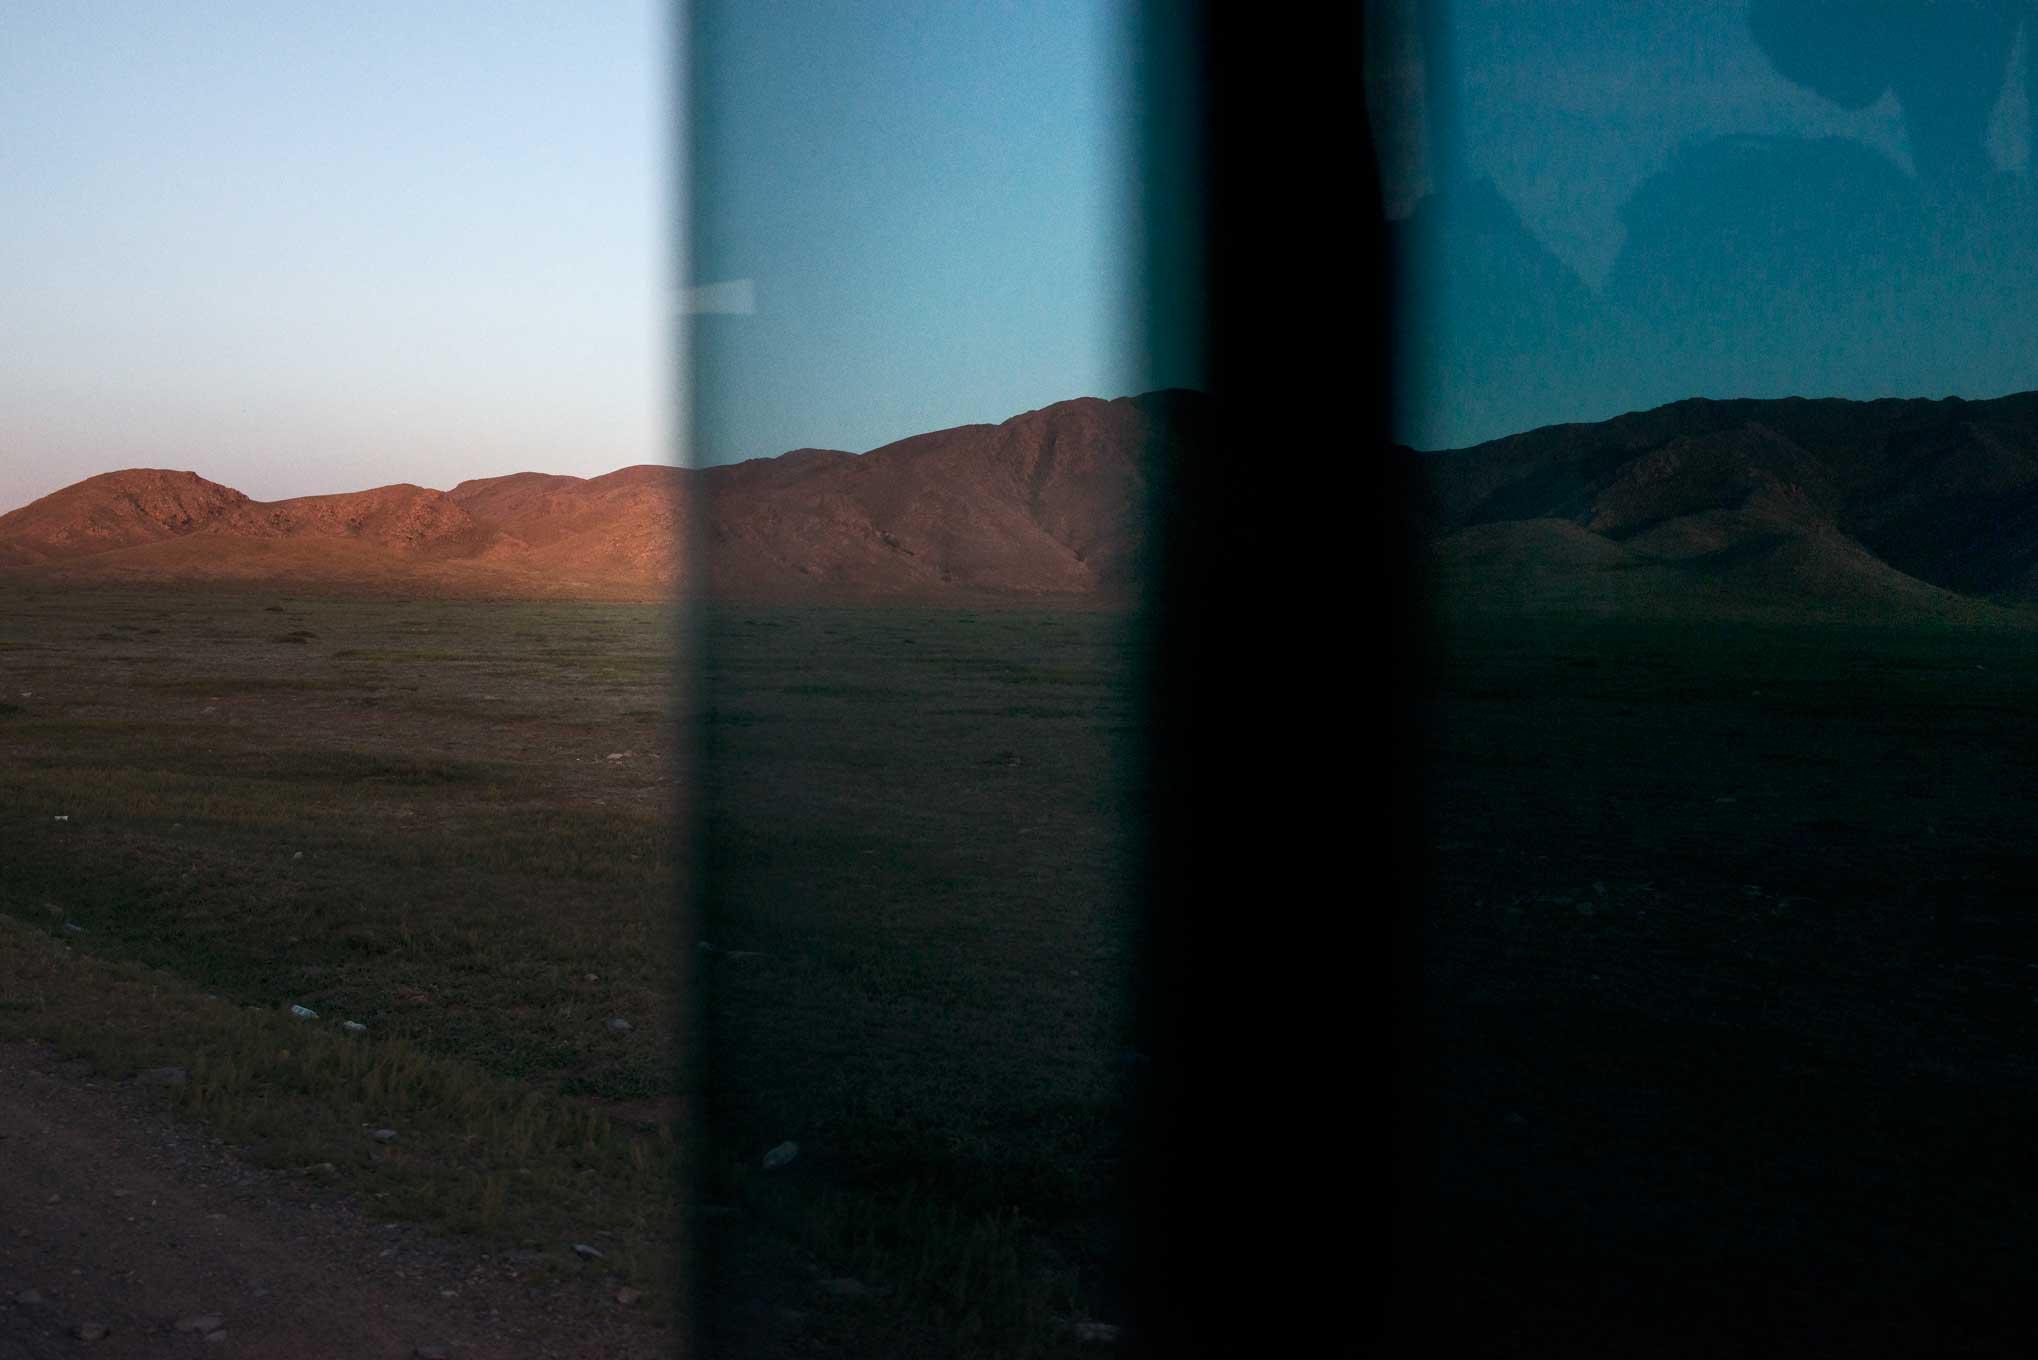 Red Hill Karakorum, Mongolia